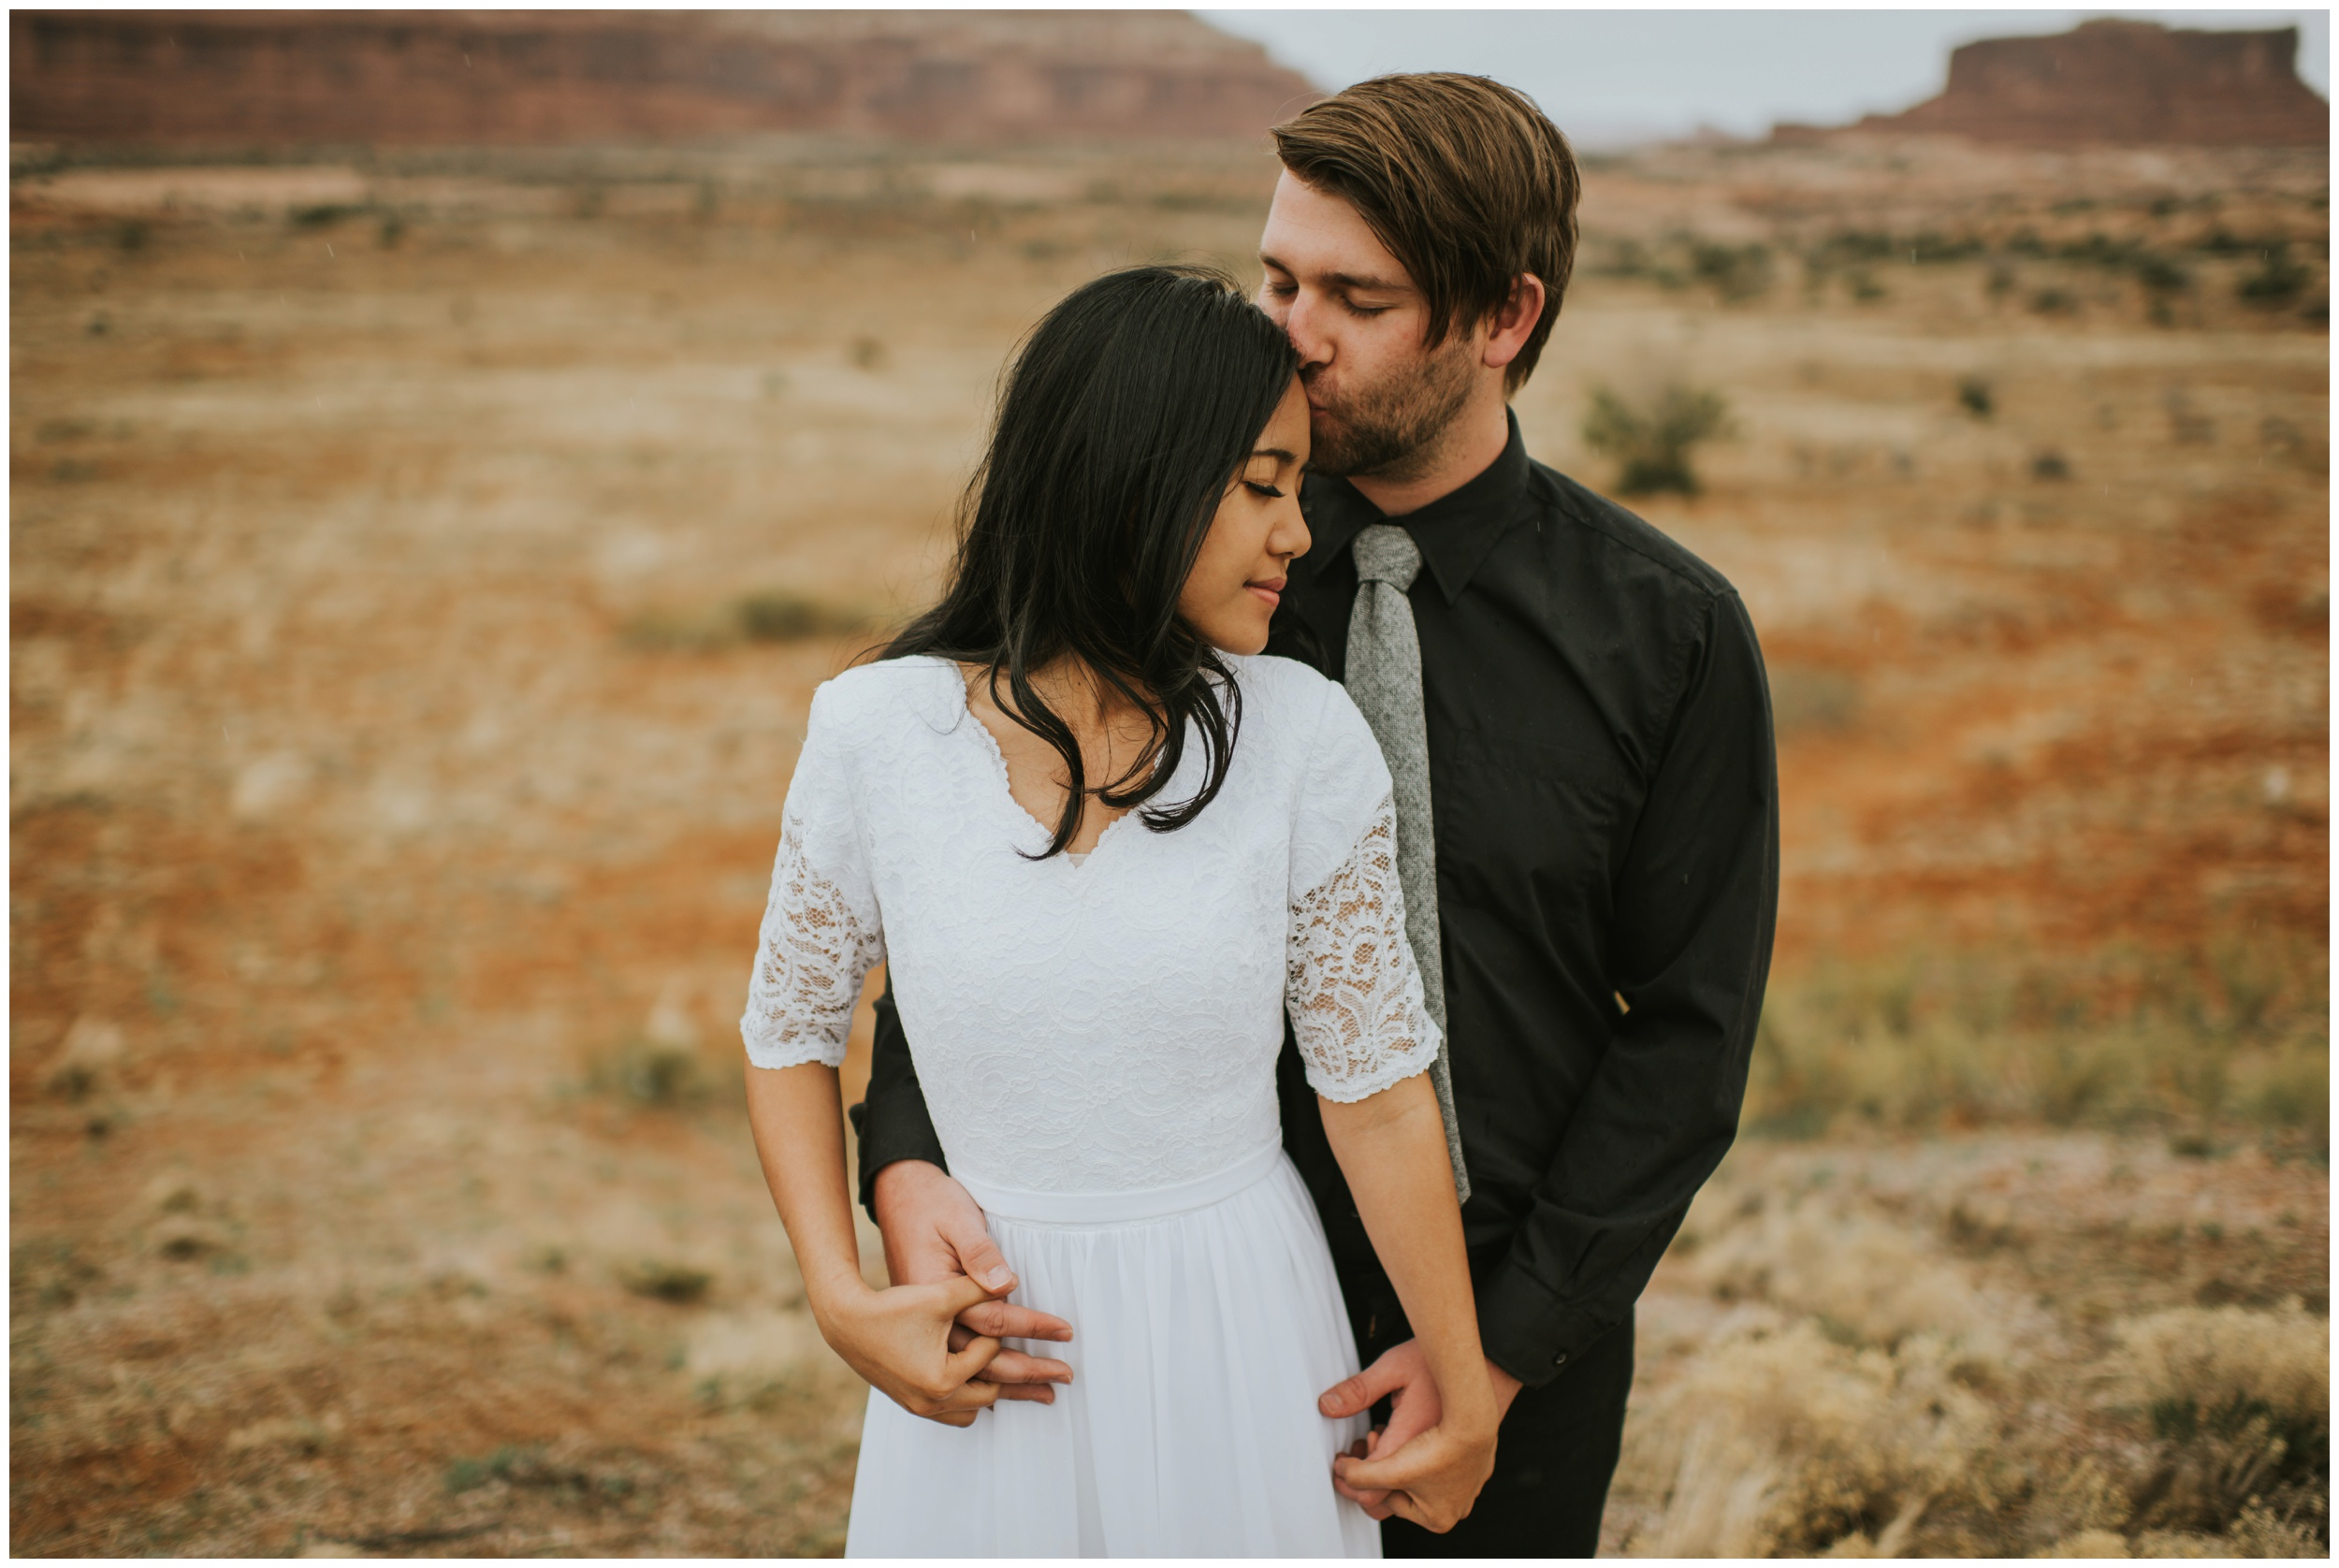 intimate portrait, sweet forehead kisses, candid photography |Moab Utah, Photographer www.riversandroadsphotography.com